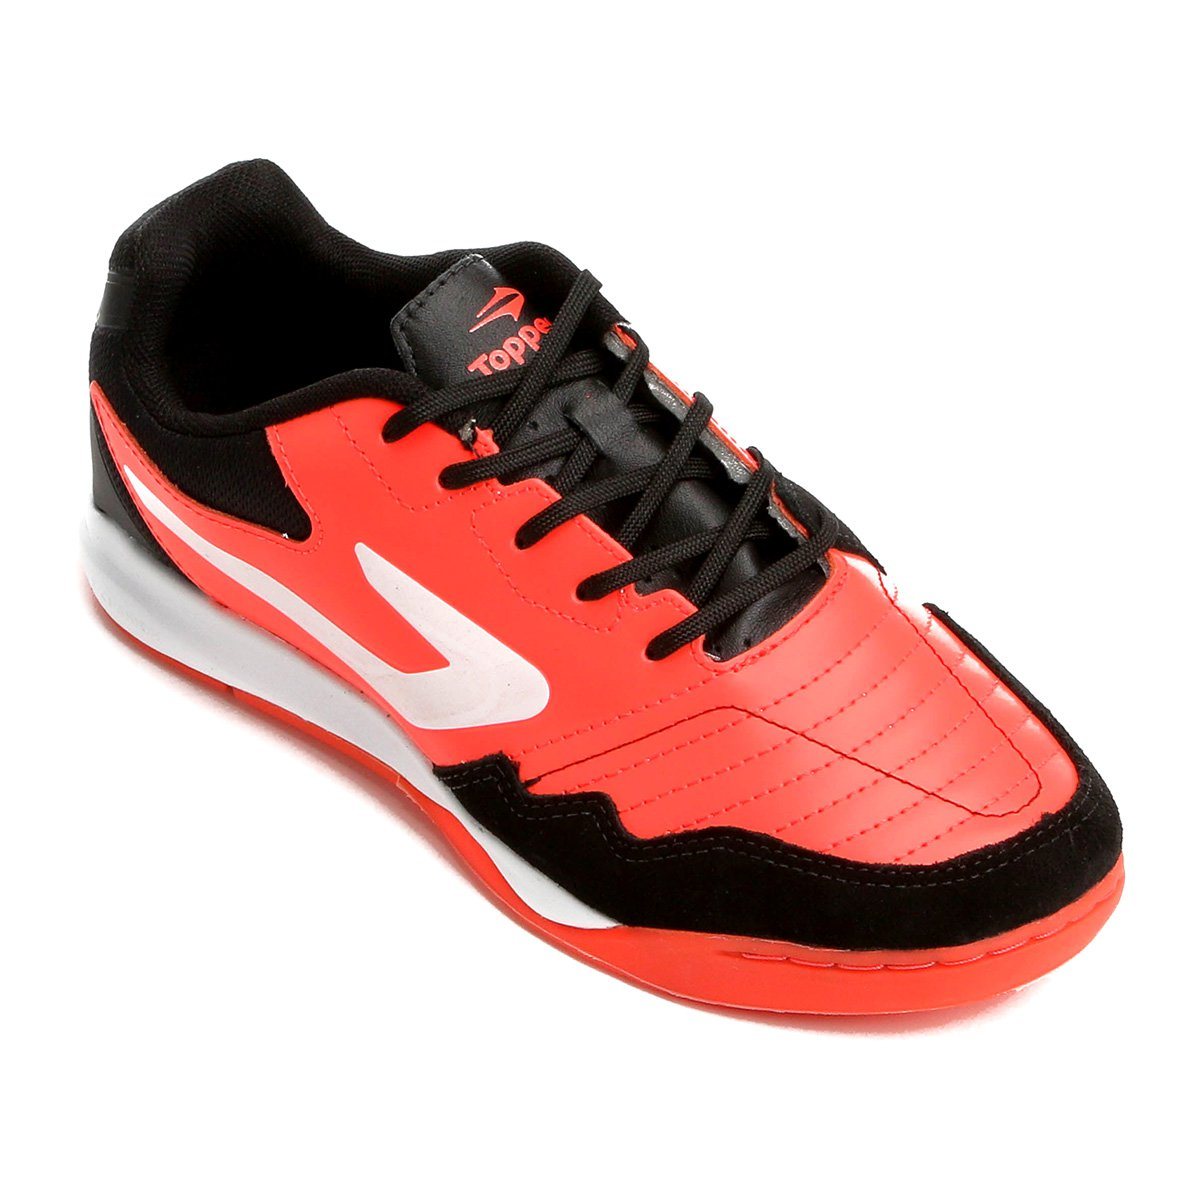 c0e6848847 Chuteira Futsal Topper Dominator Pro - Compre Agora